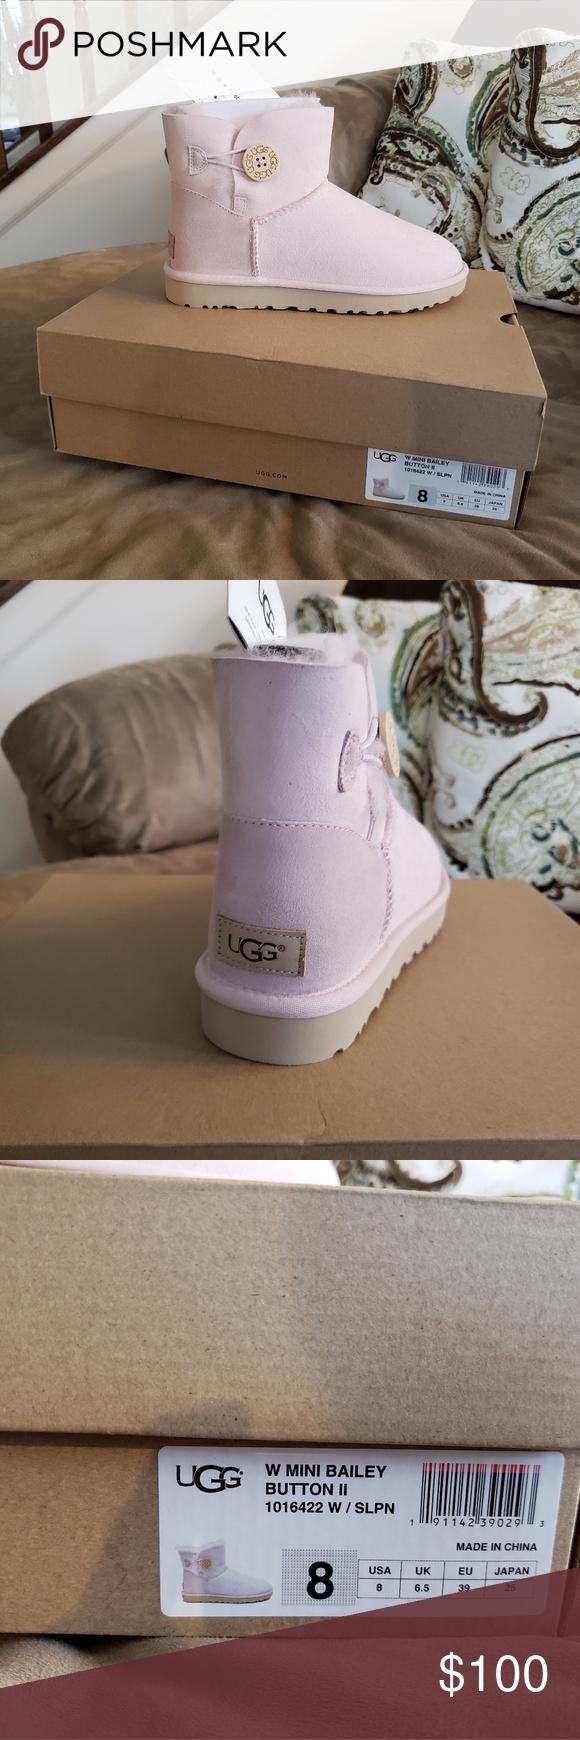 79f2baf4657 NEW IN BOX UGG Mini Bailey Seashell Pink Size 8 UGG Mini Bailey ...